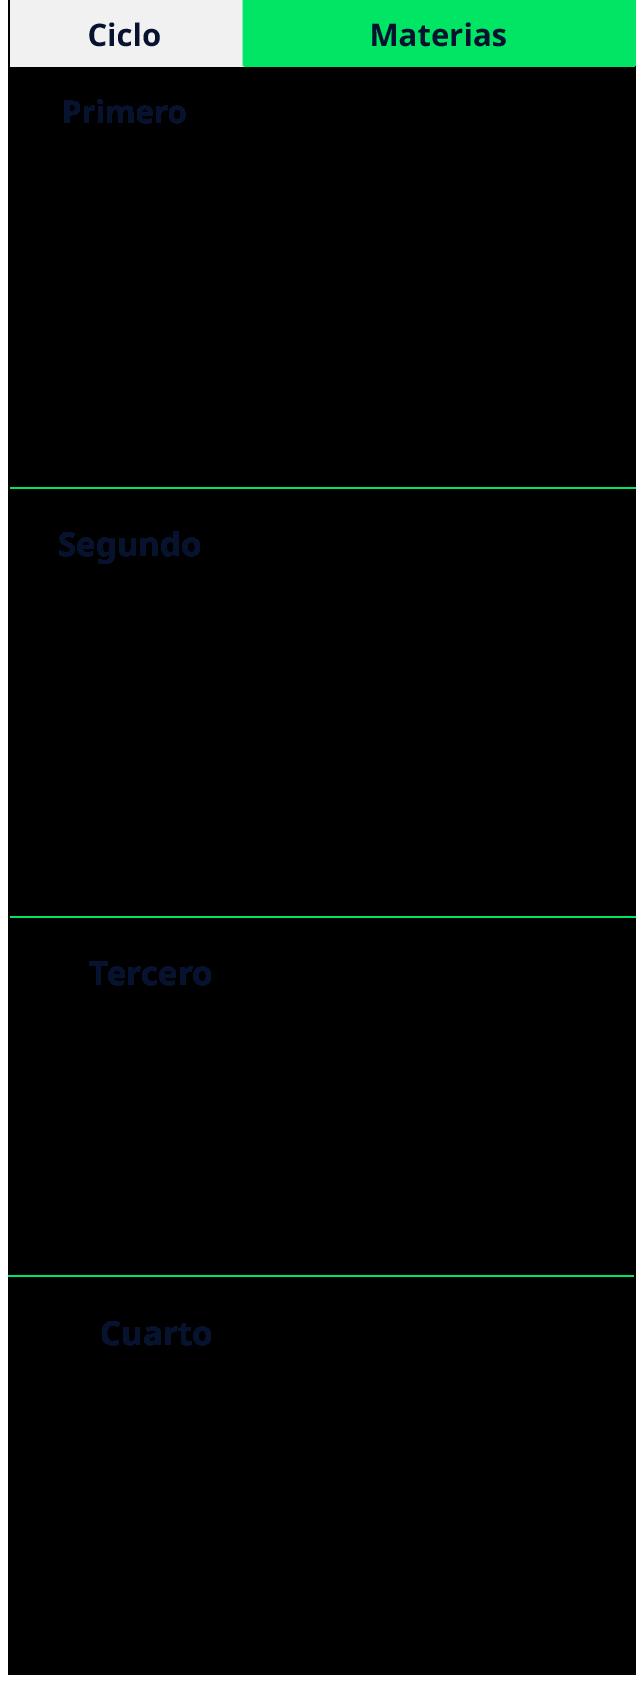 mapa curricular de